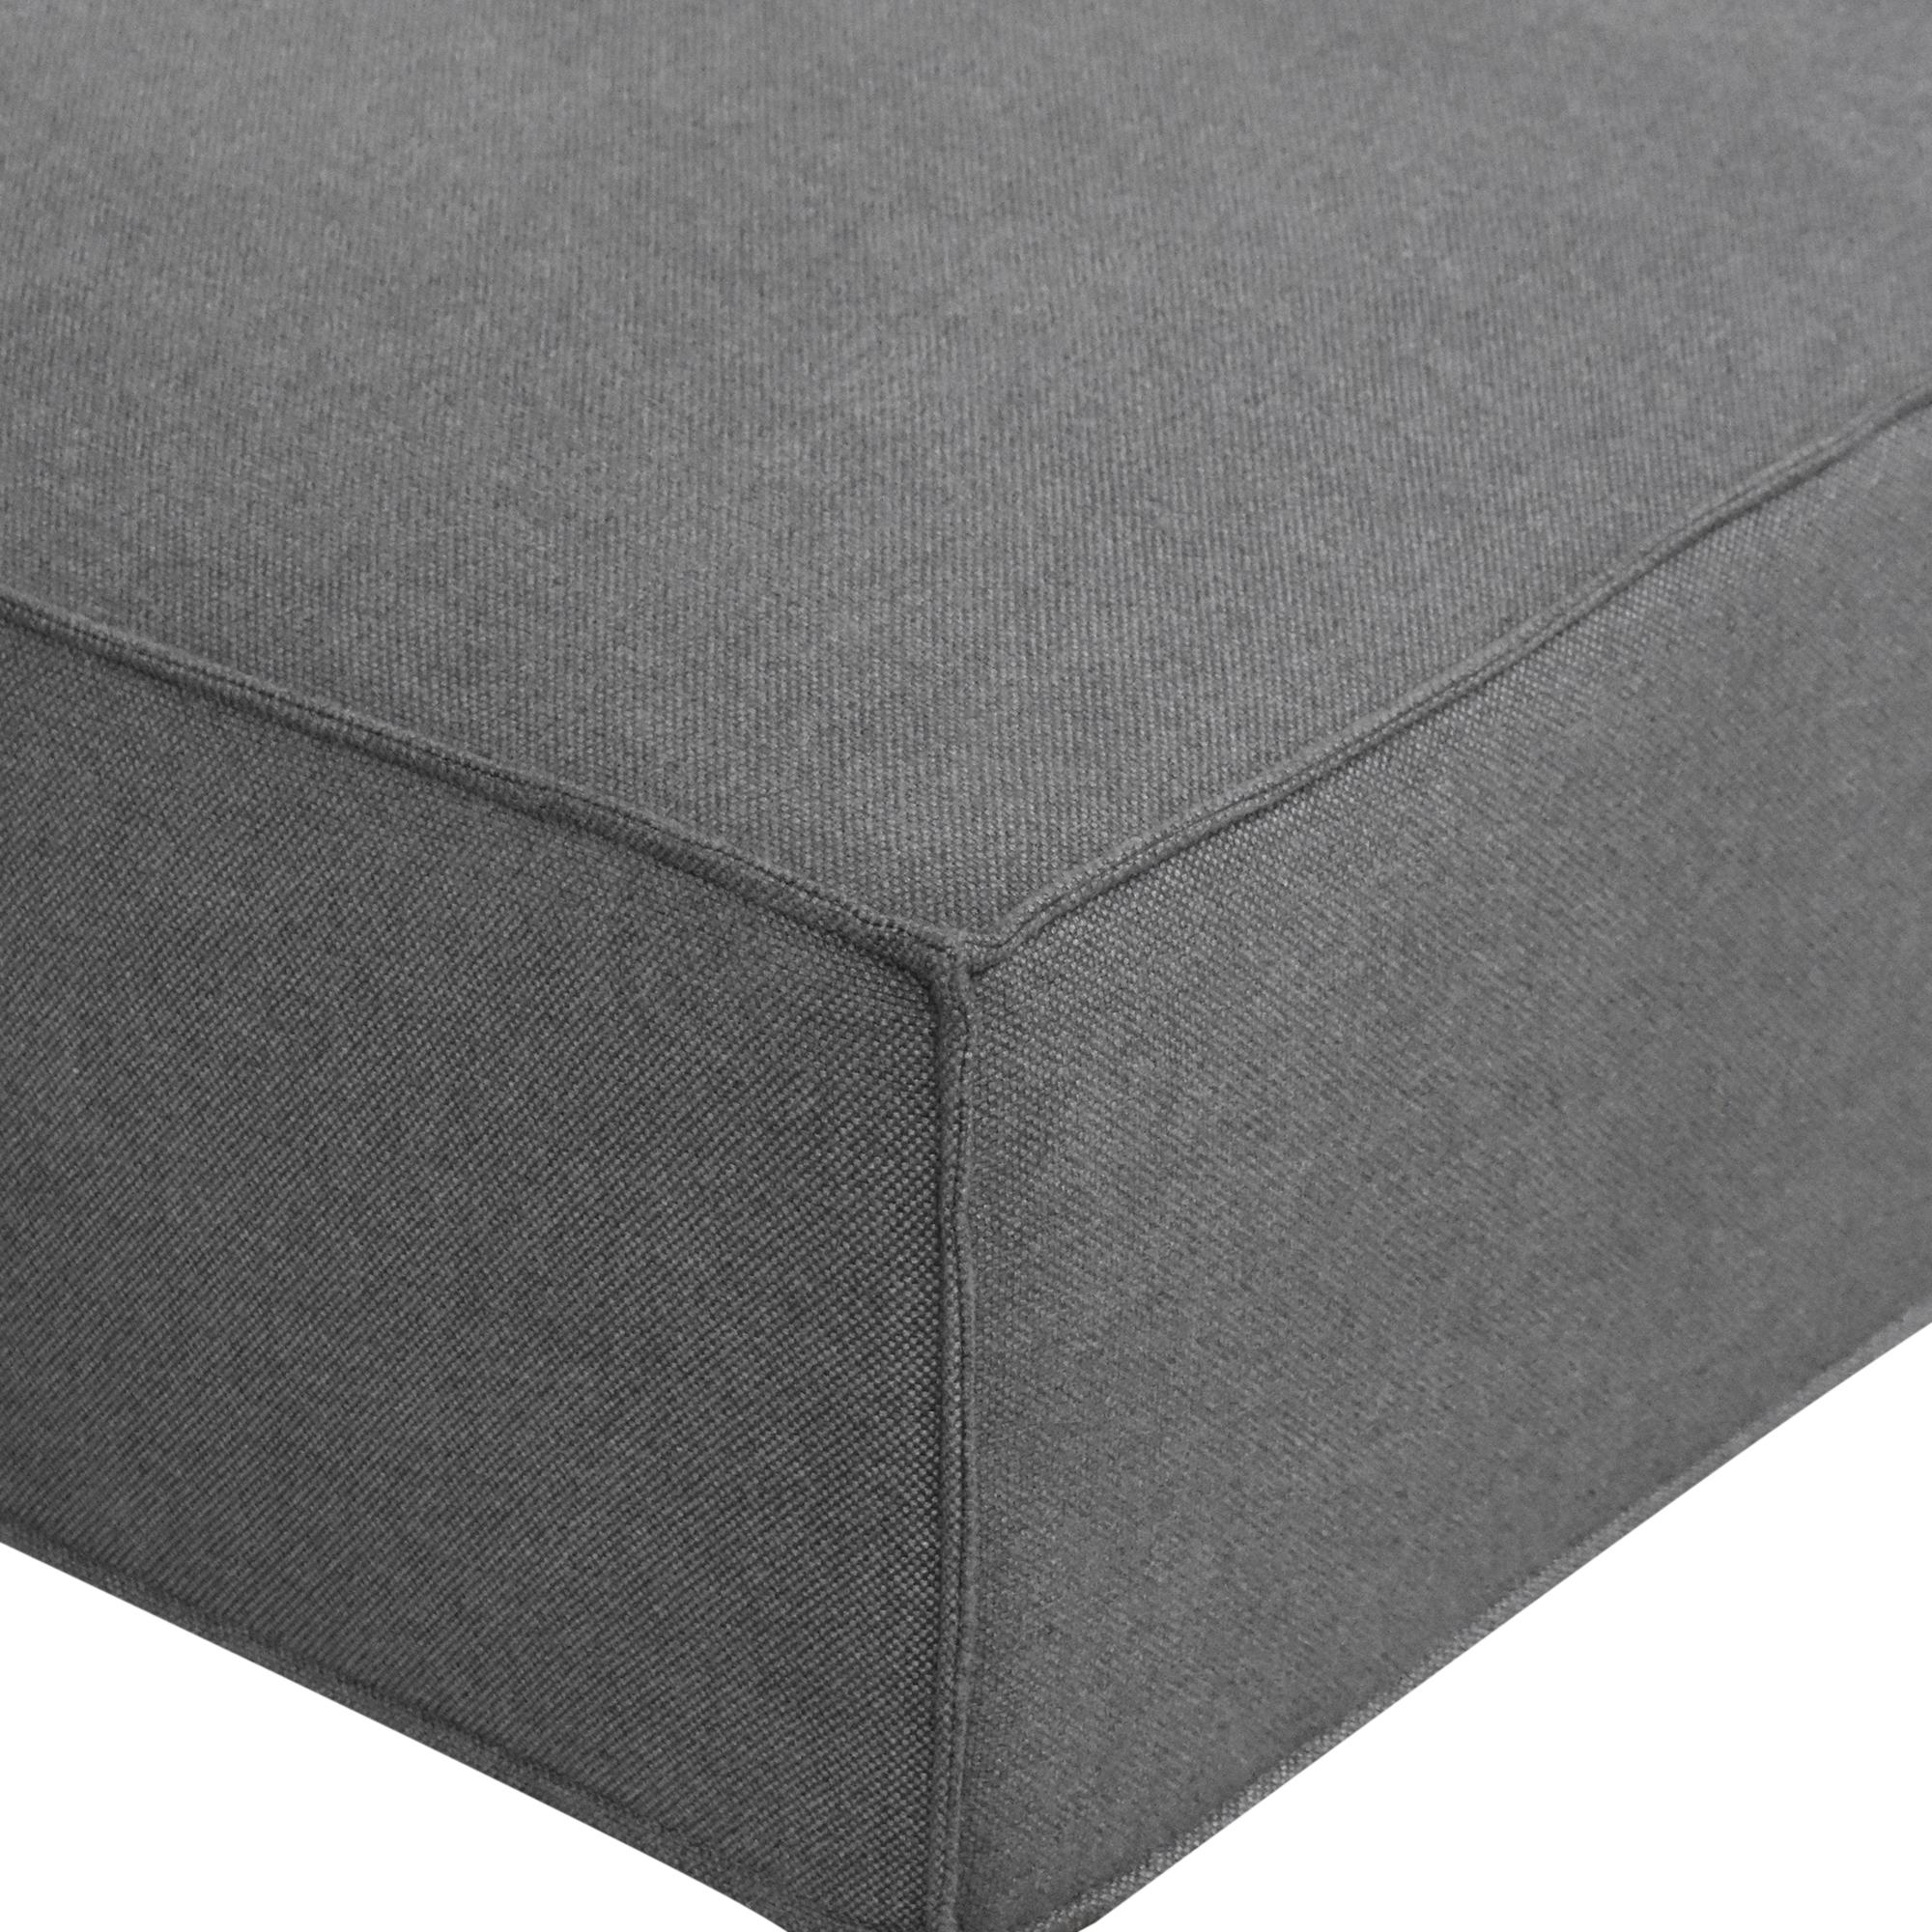 Rove Concepts Rove Concepts Porter Ottoman gray